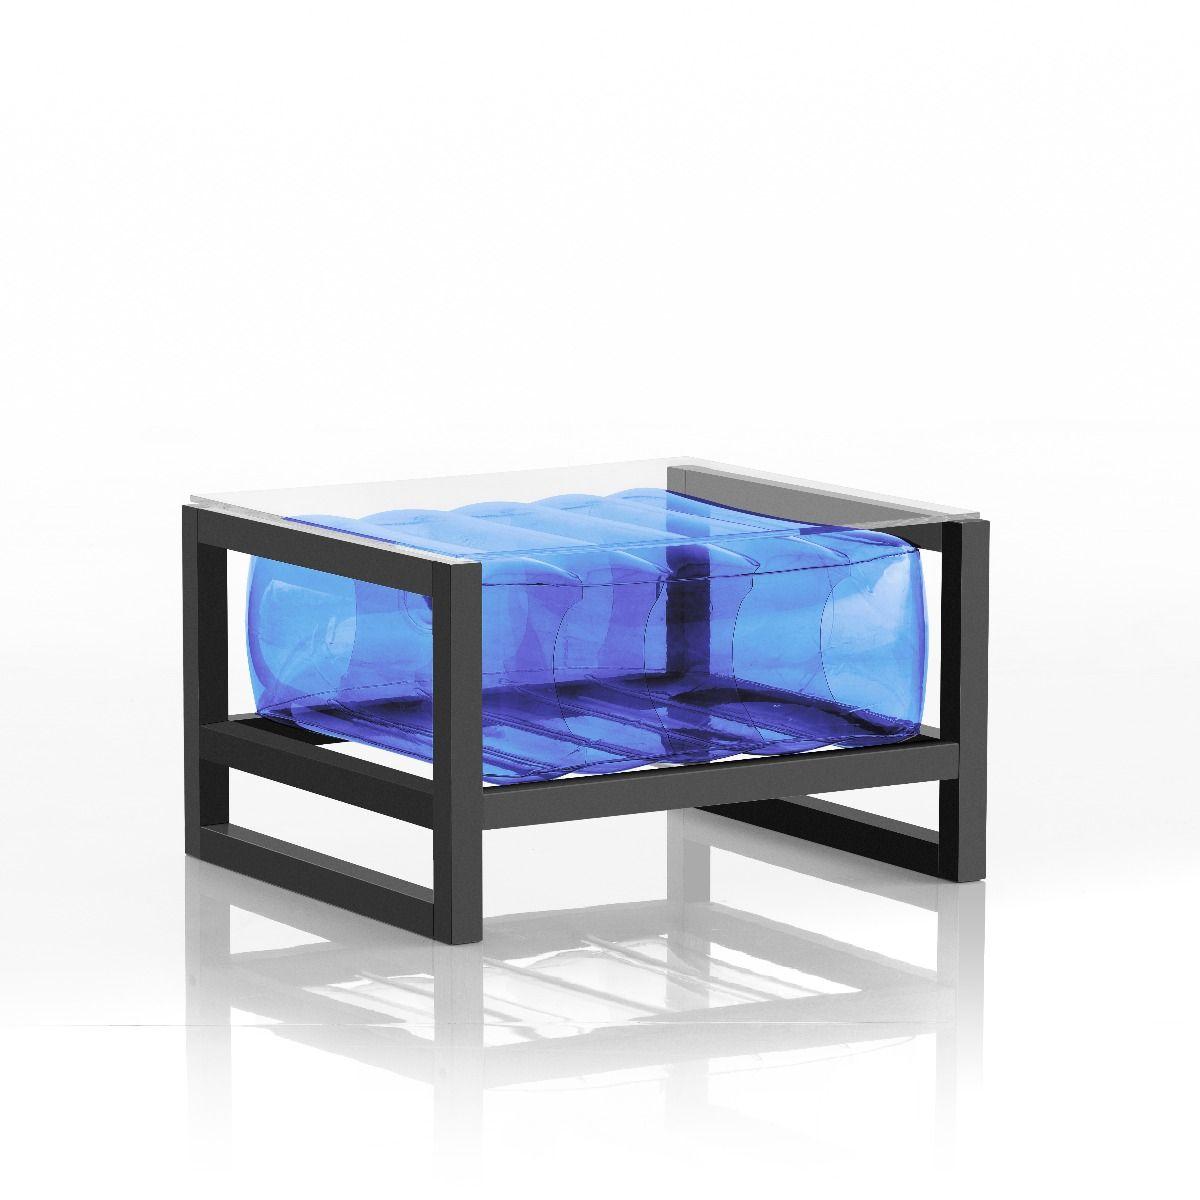 Table basse tpu bleu cadre en aluminium